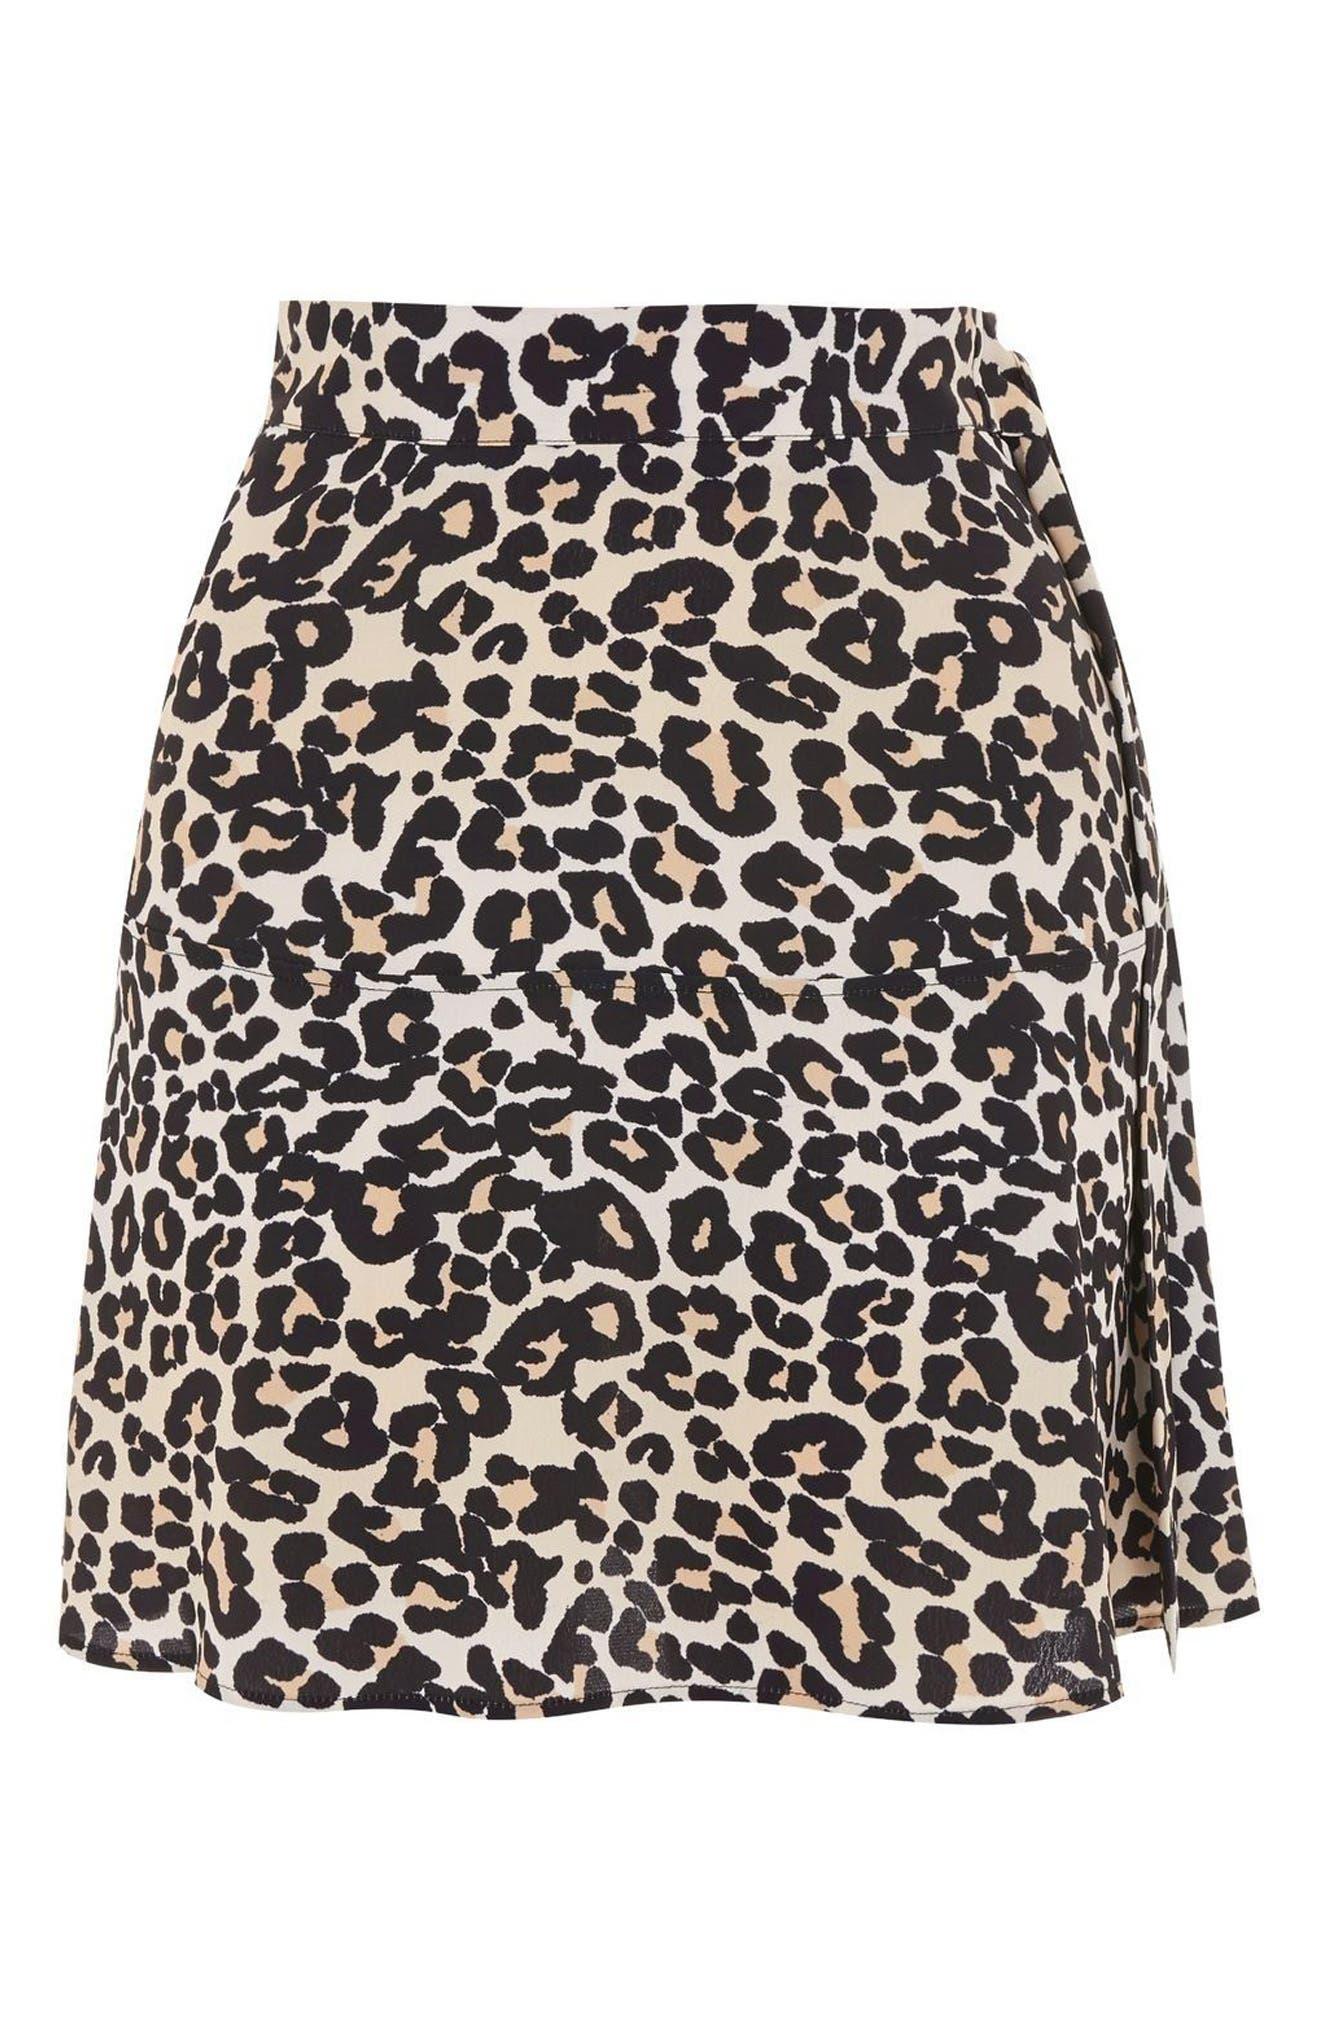 Leopard Print Miniskirt,                             Alternate thumbnail 4, color,                             211